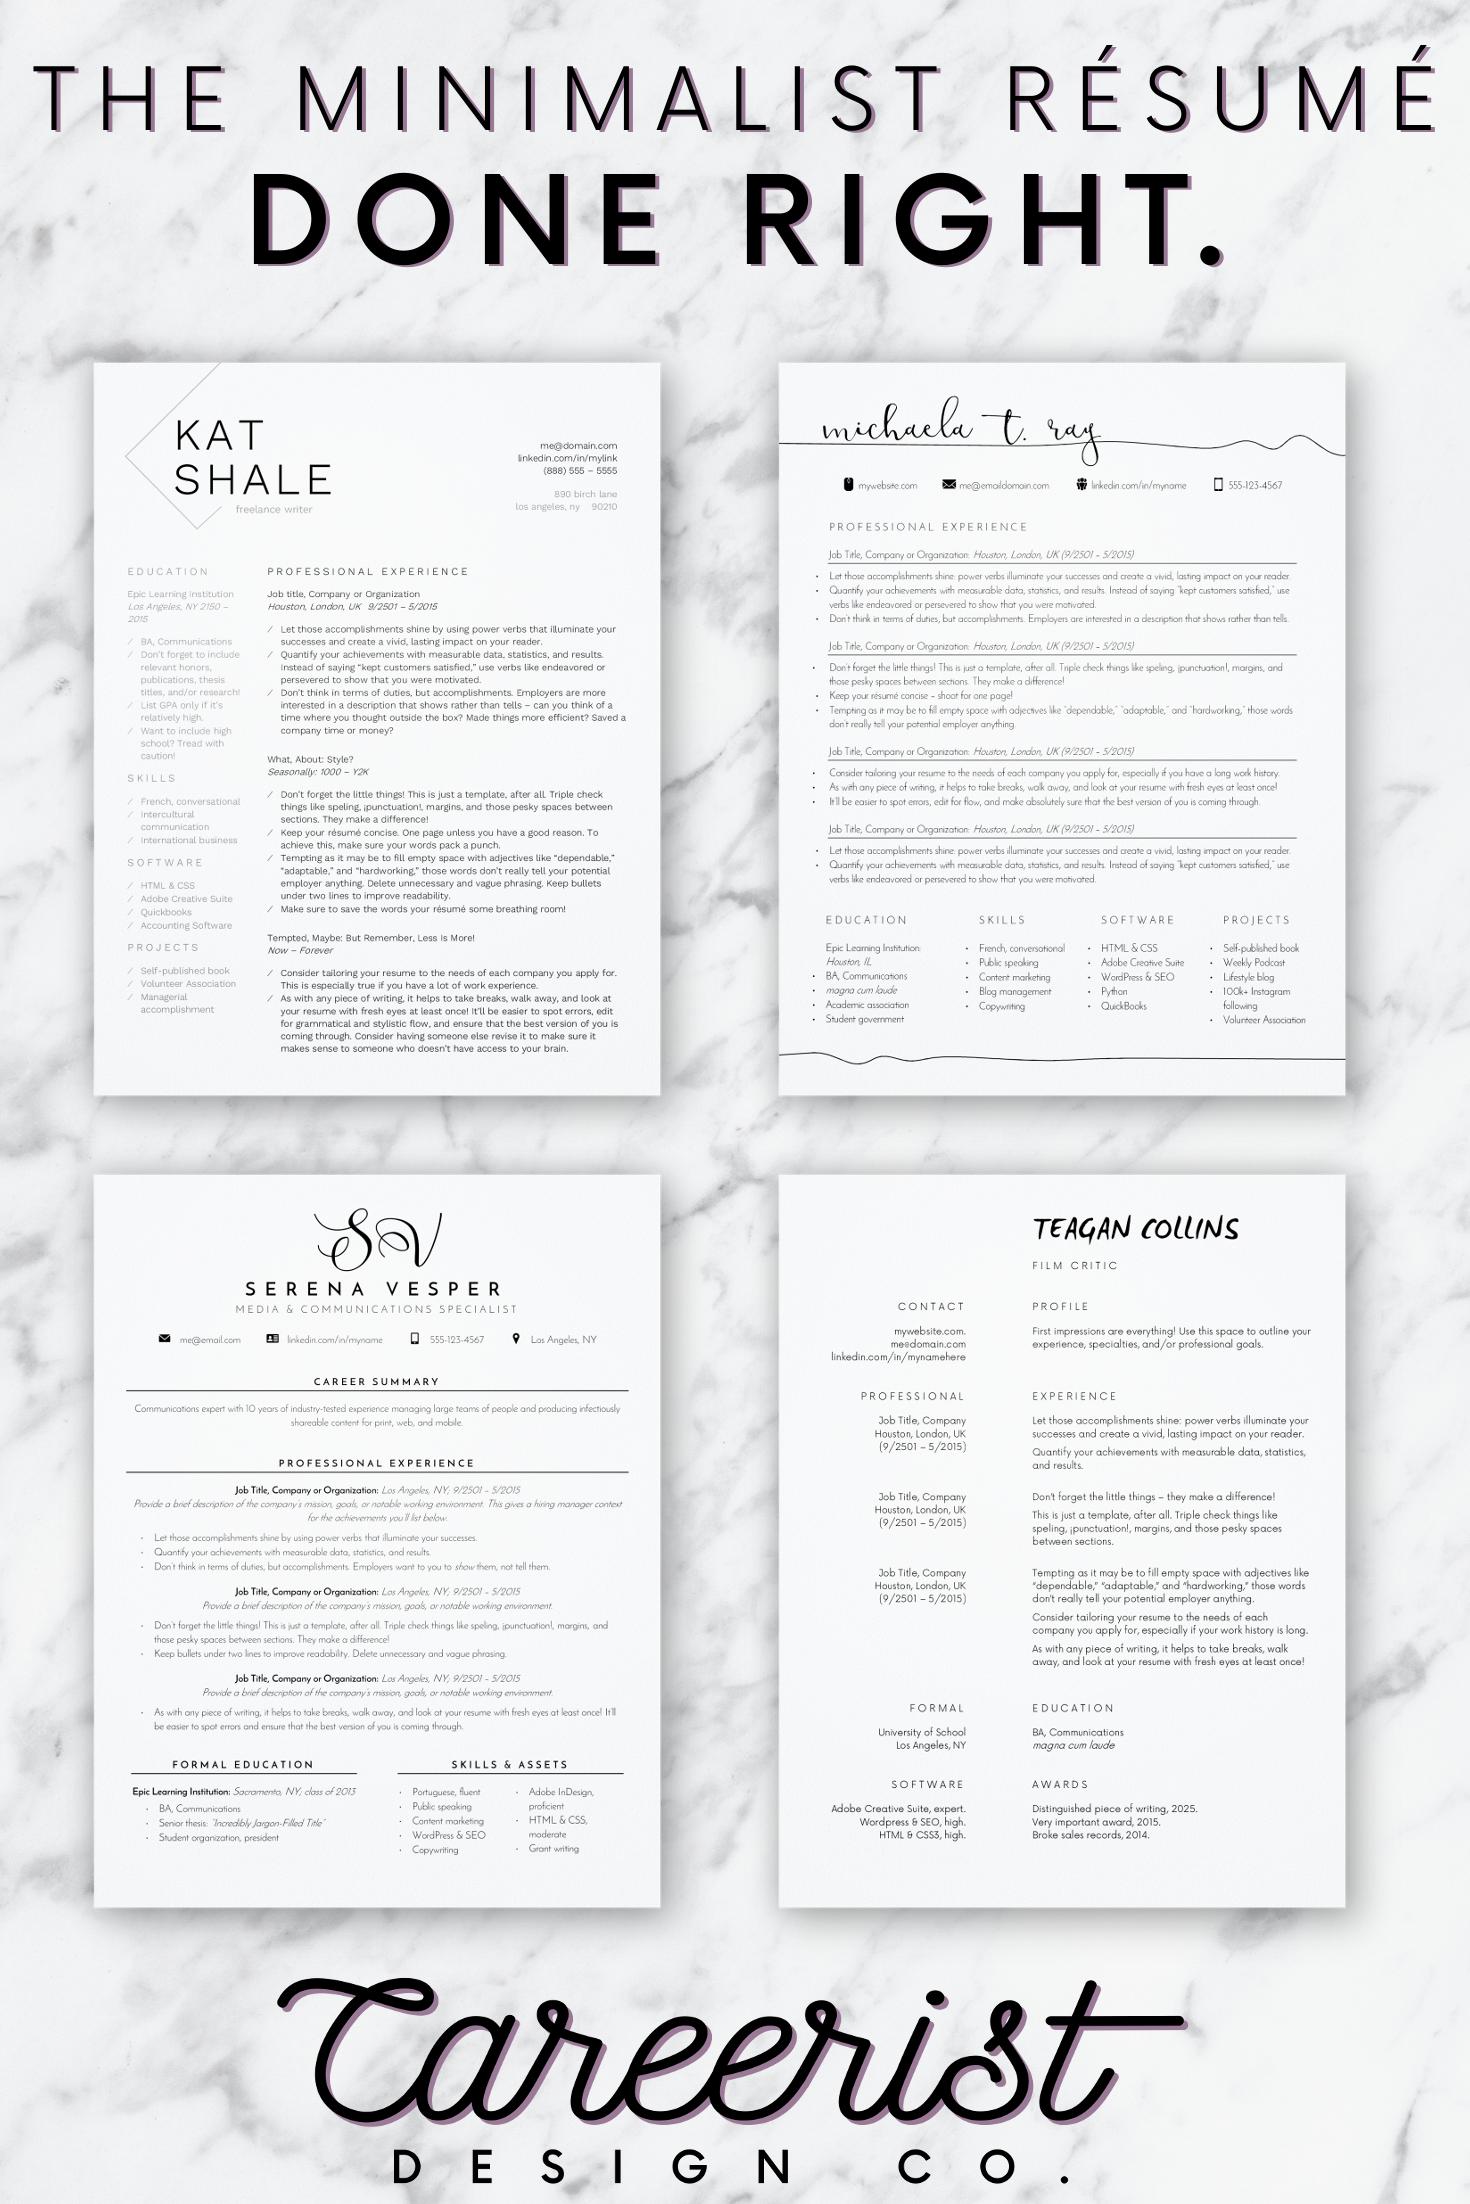 Modern Minimalist Resume Templates From Careerist Design Co On